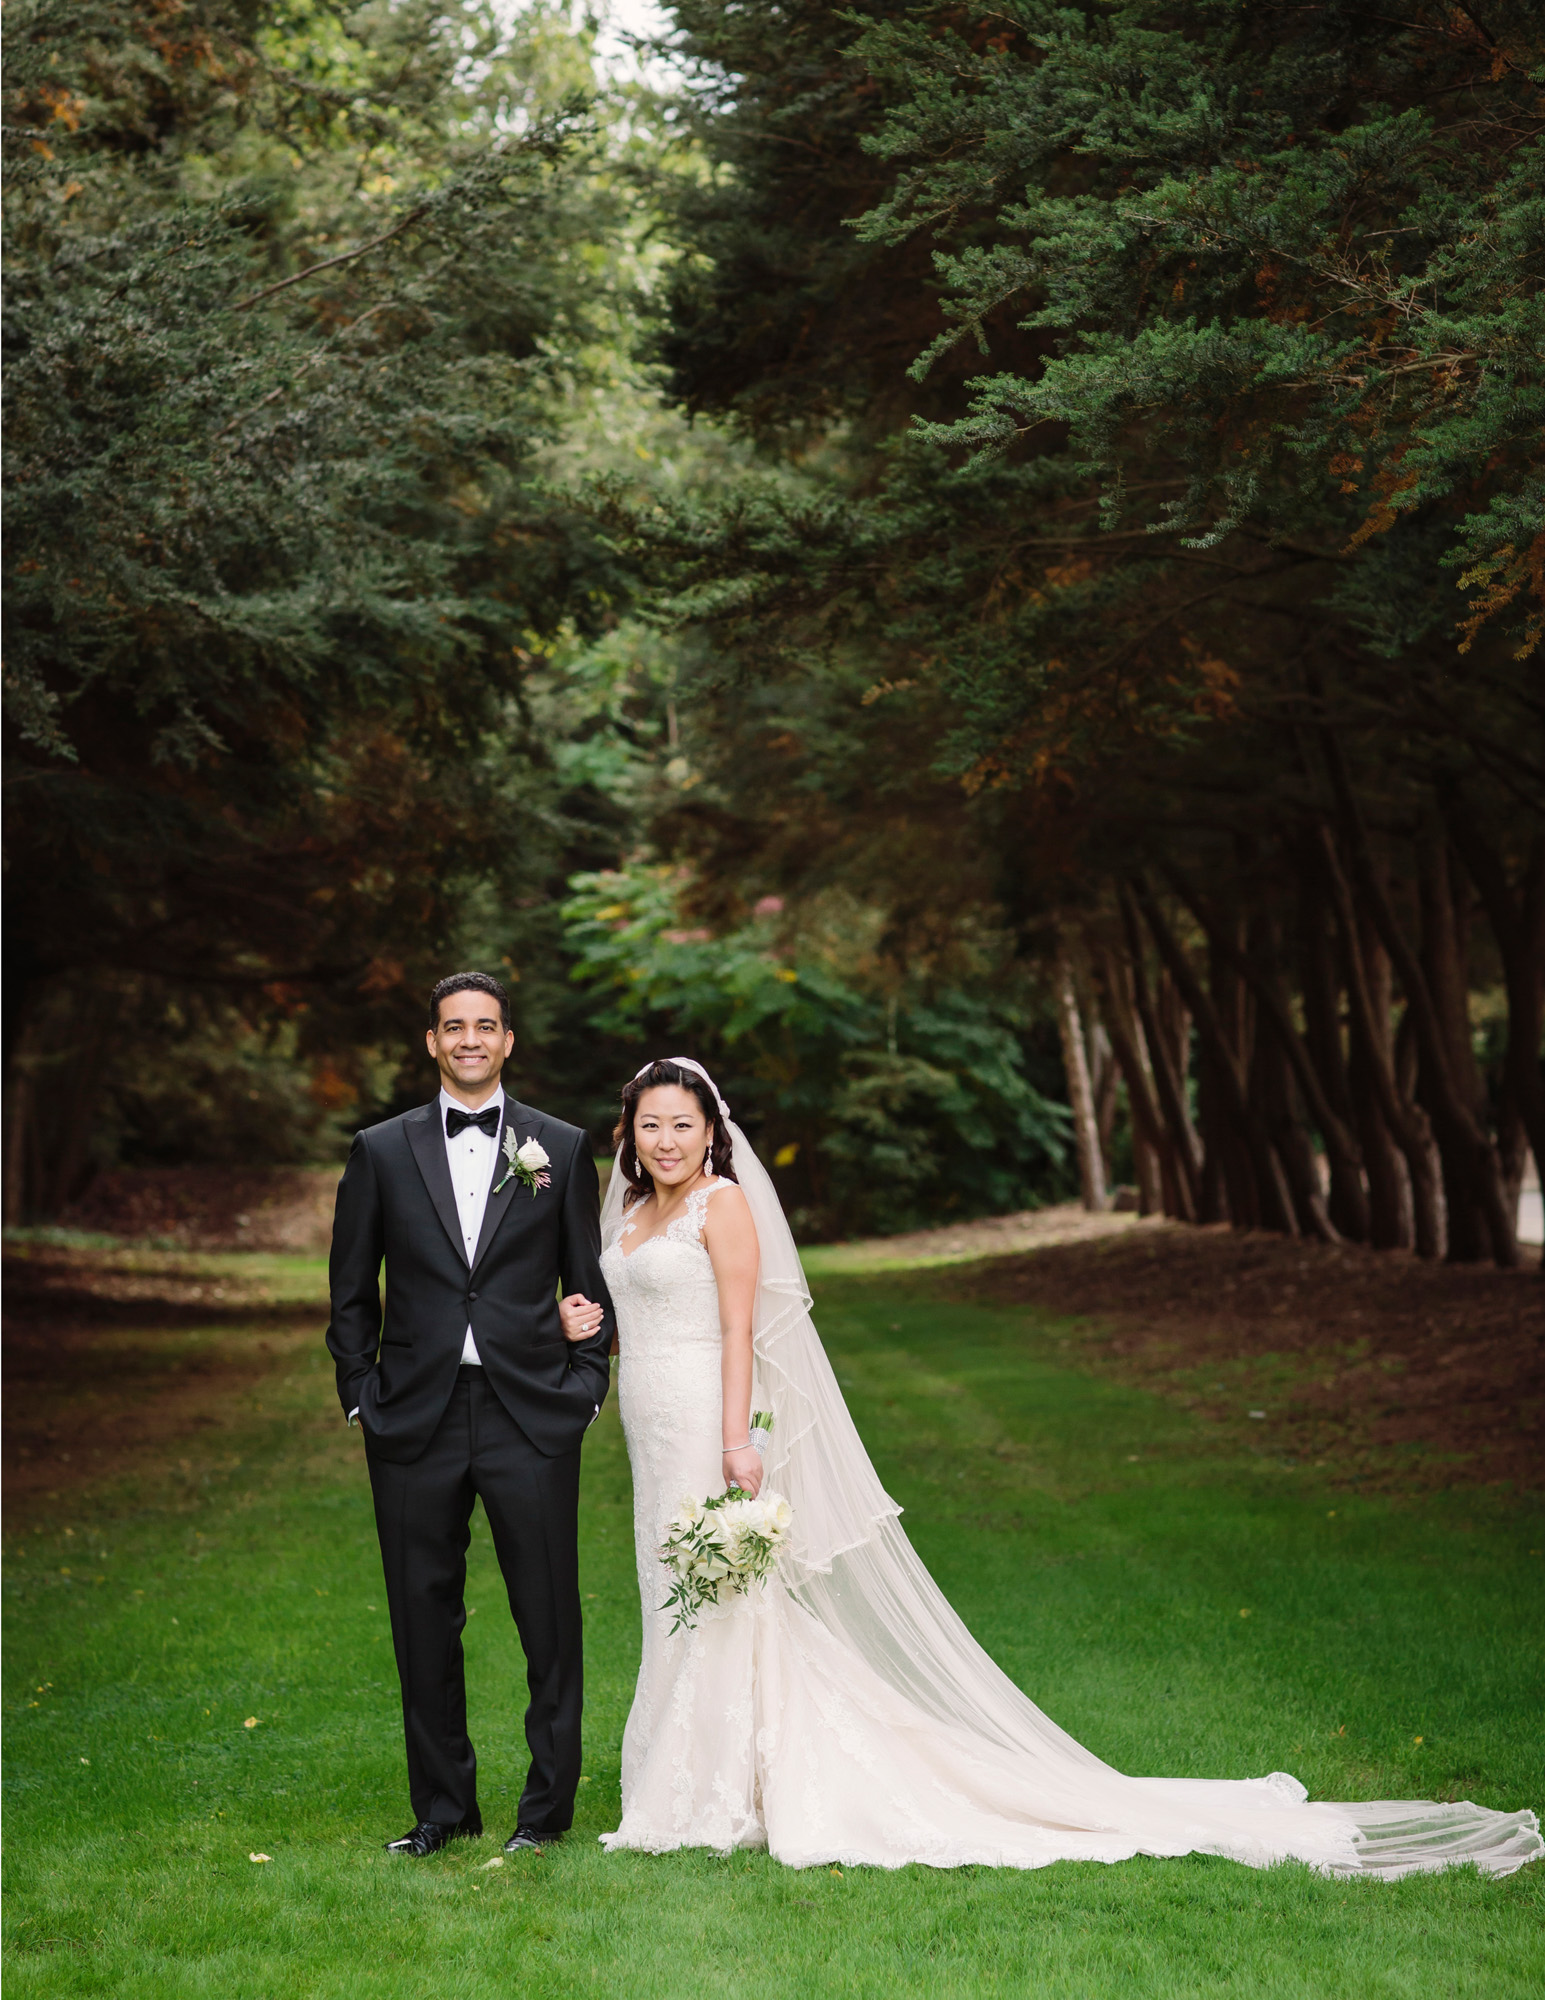 30_Angela_Michael_De_Seversky_Mansion_Wedding_Glenhead_NY_Tanya_Salazar_Photography_310.jpg